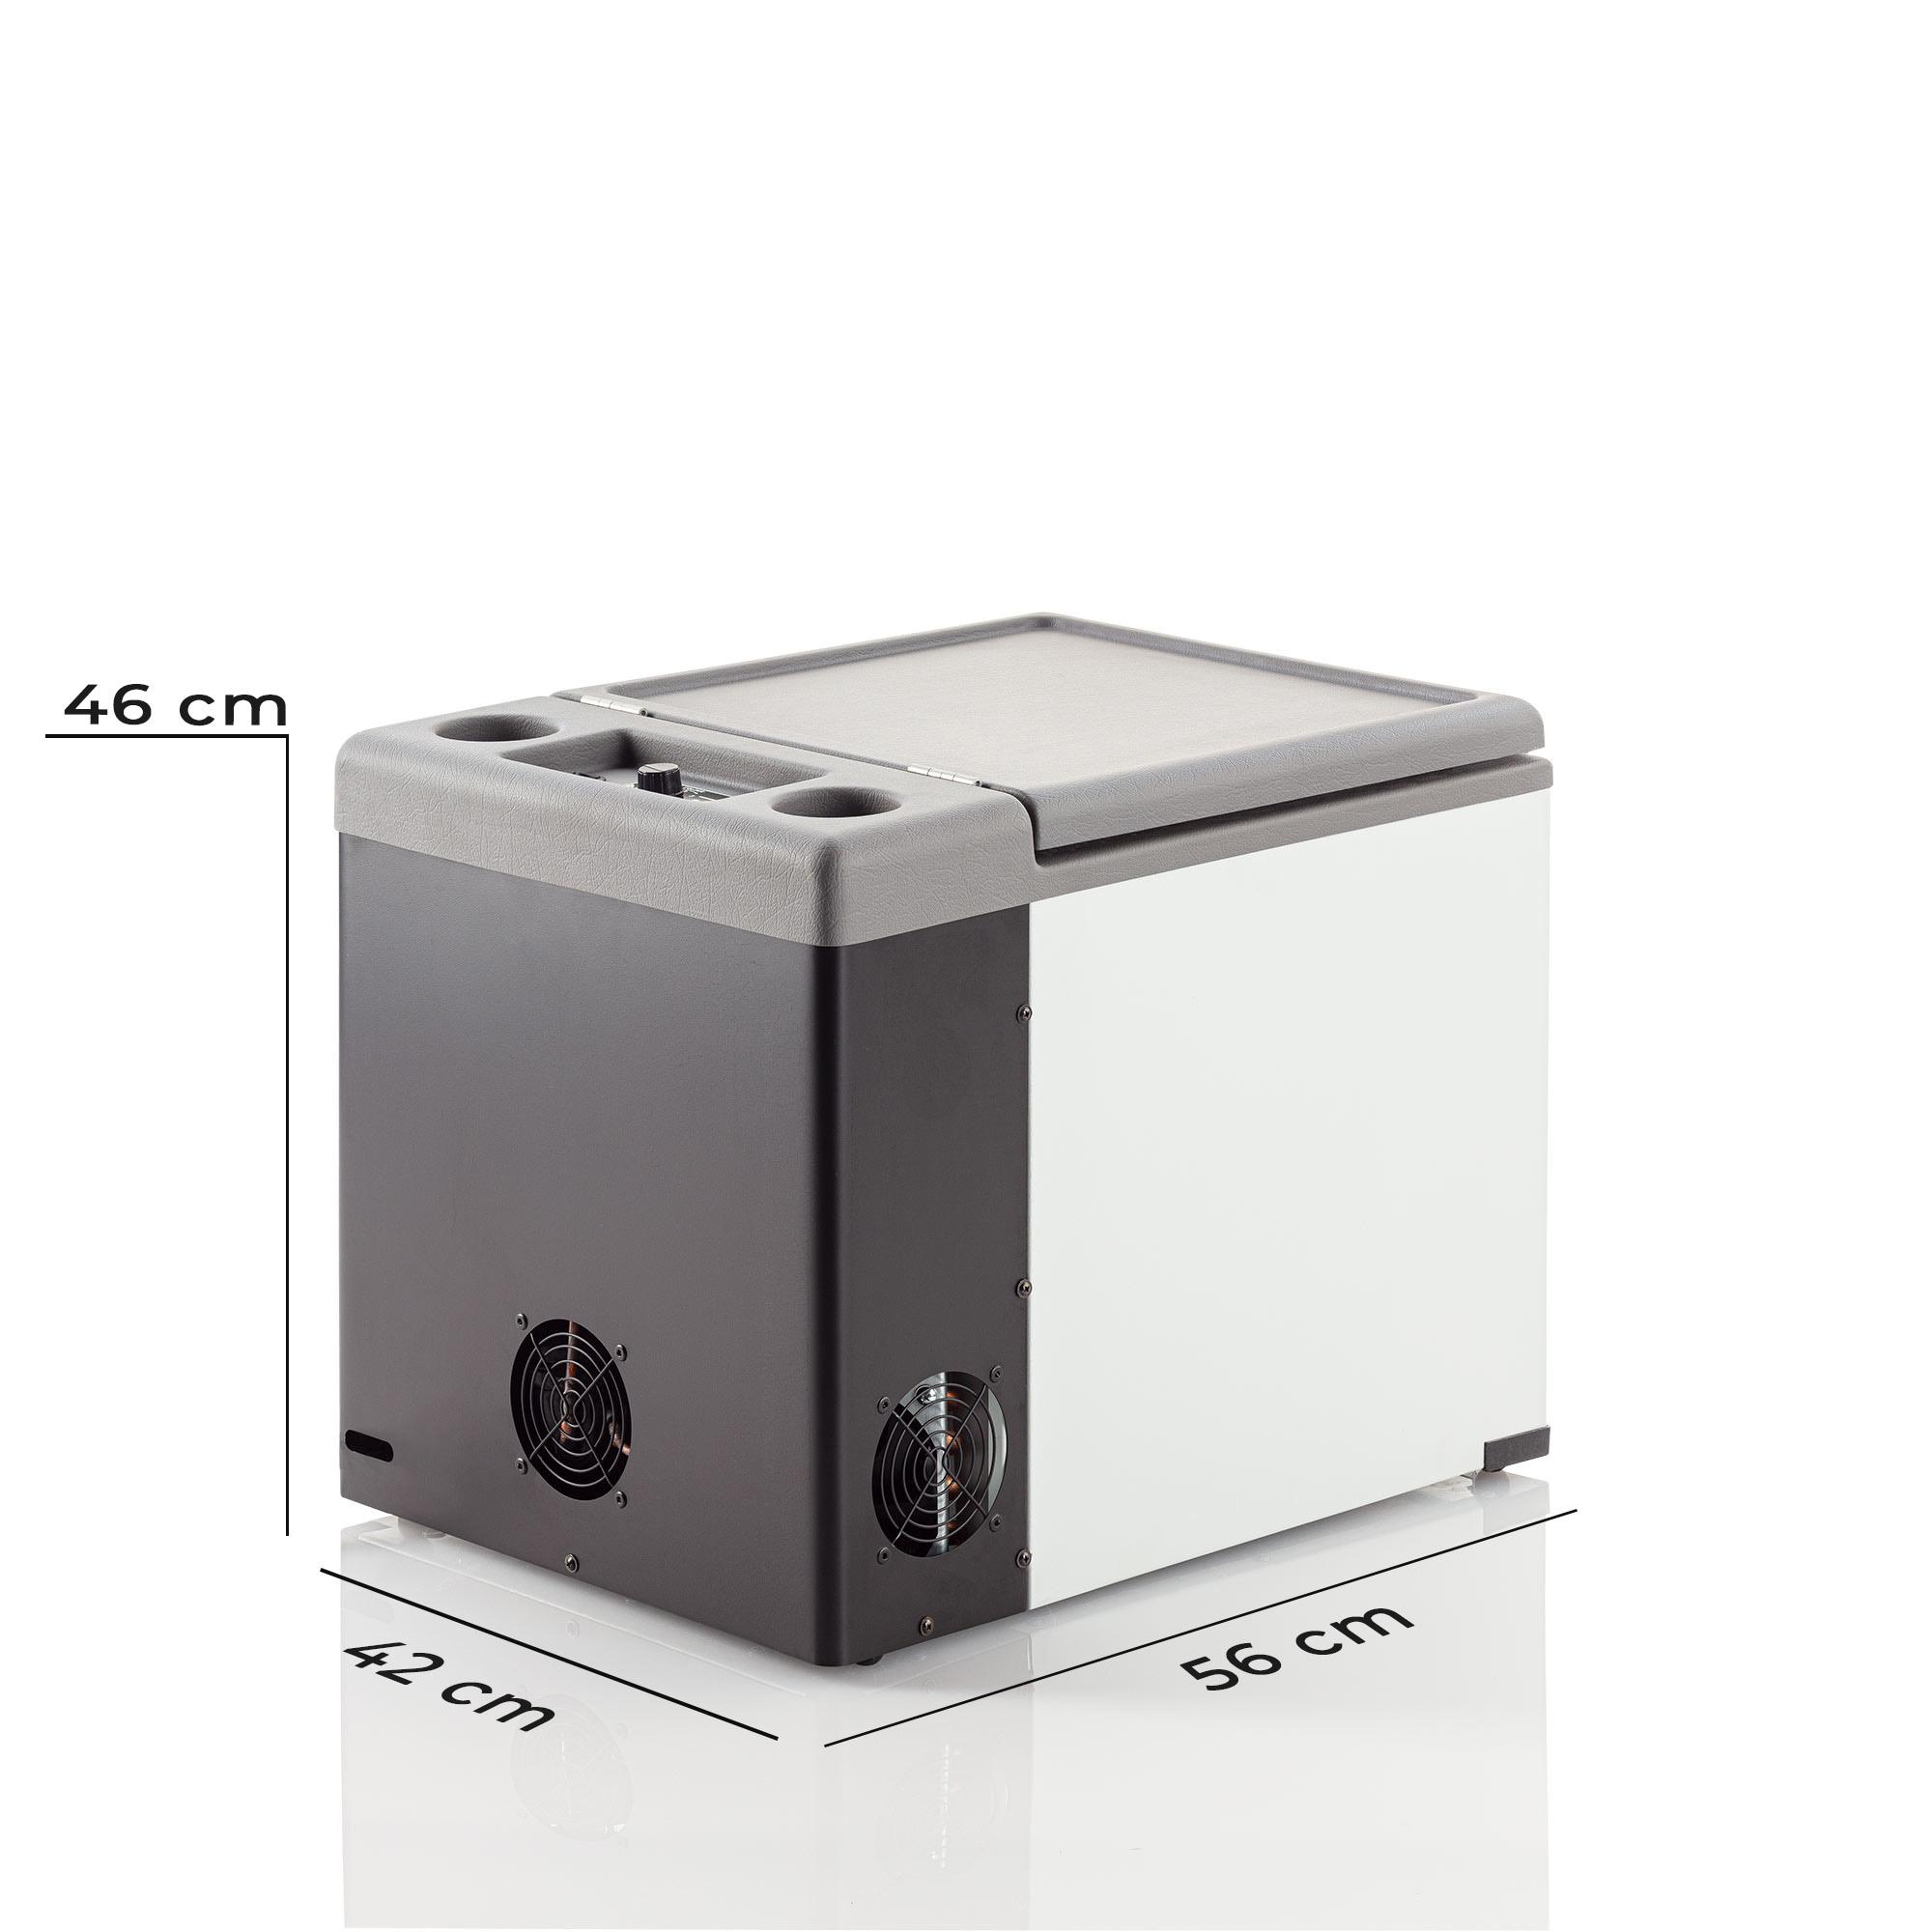 MPO 4245 36 LT Soğutucu Araç Buzdolabı